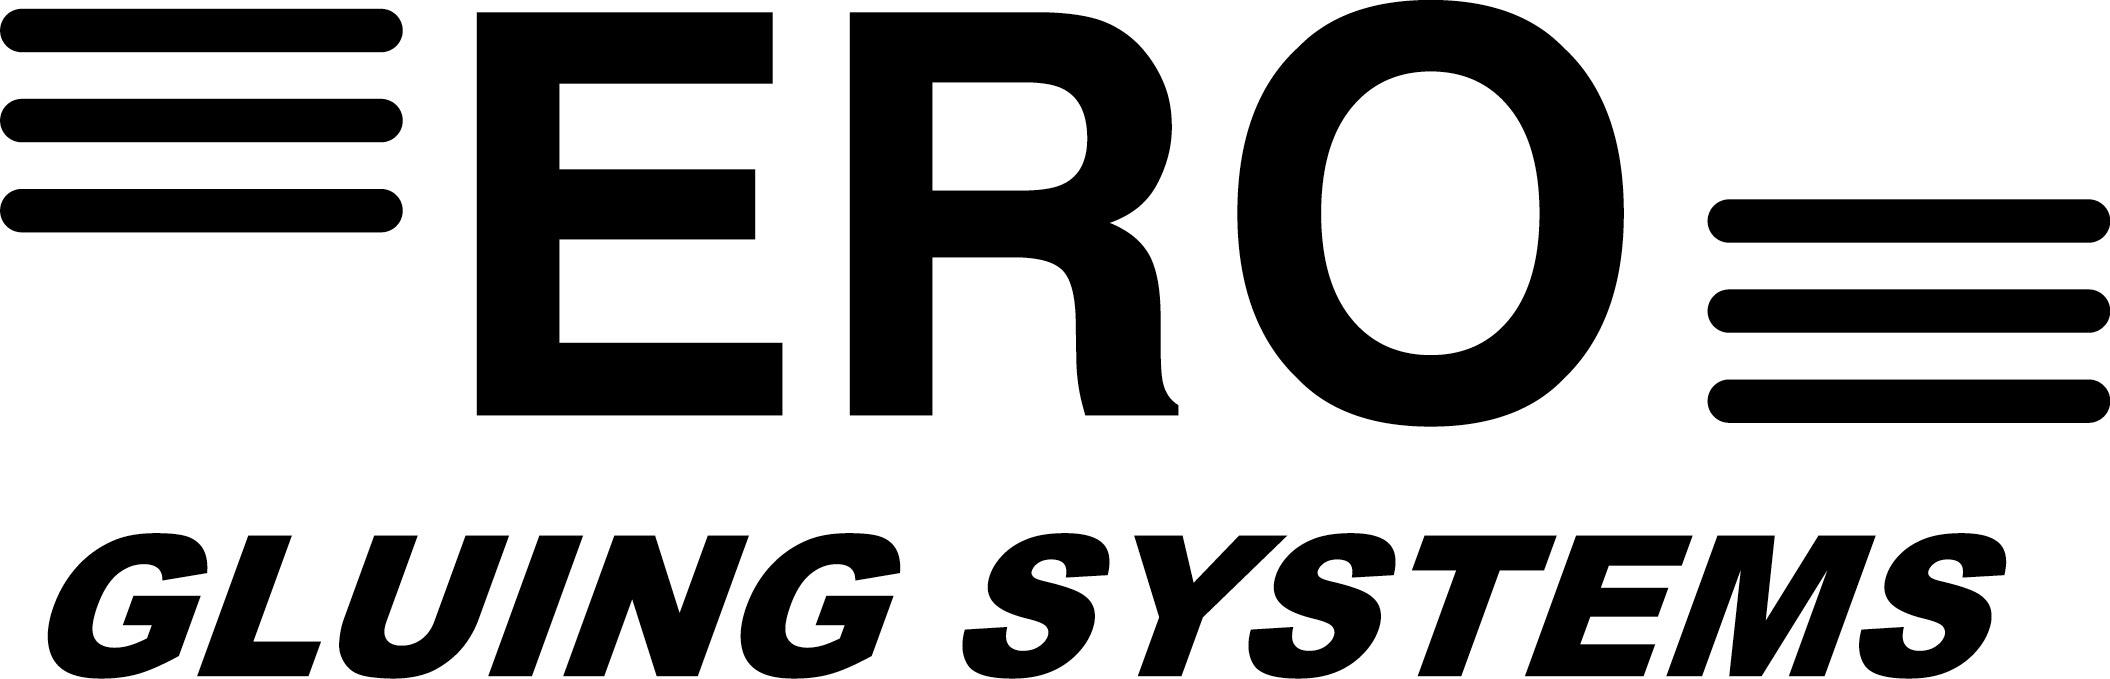 ero-gluing-systems-logo